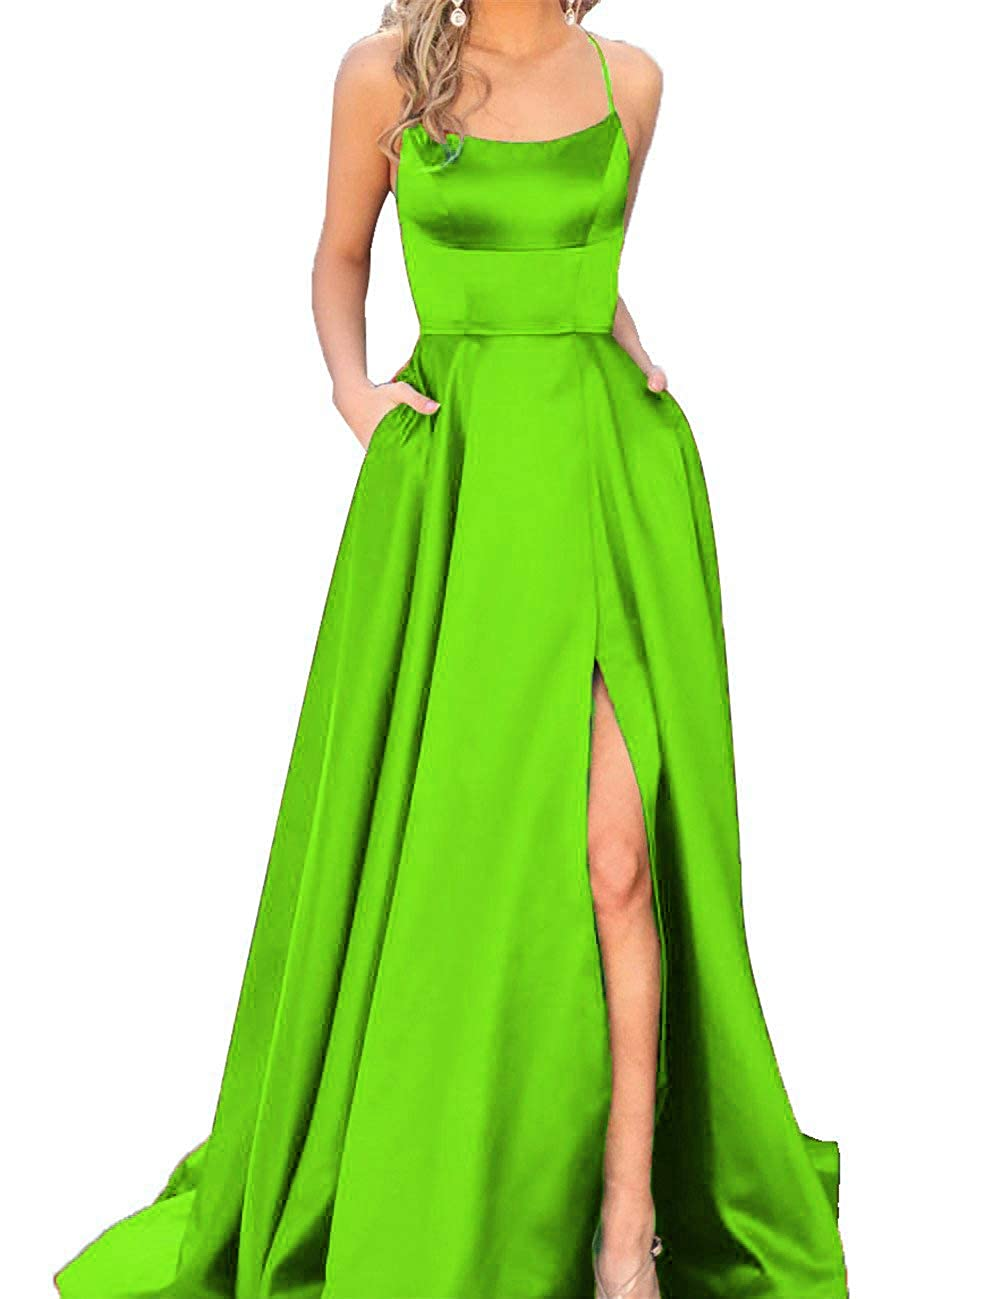 Lime Green Fanciest Women's Halter Slit Satin Prom Dresses Long Backless Evening Formal Gowns